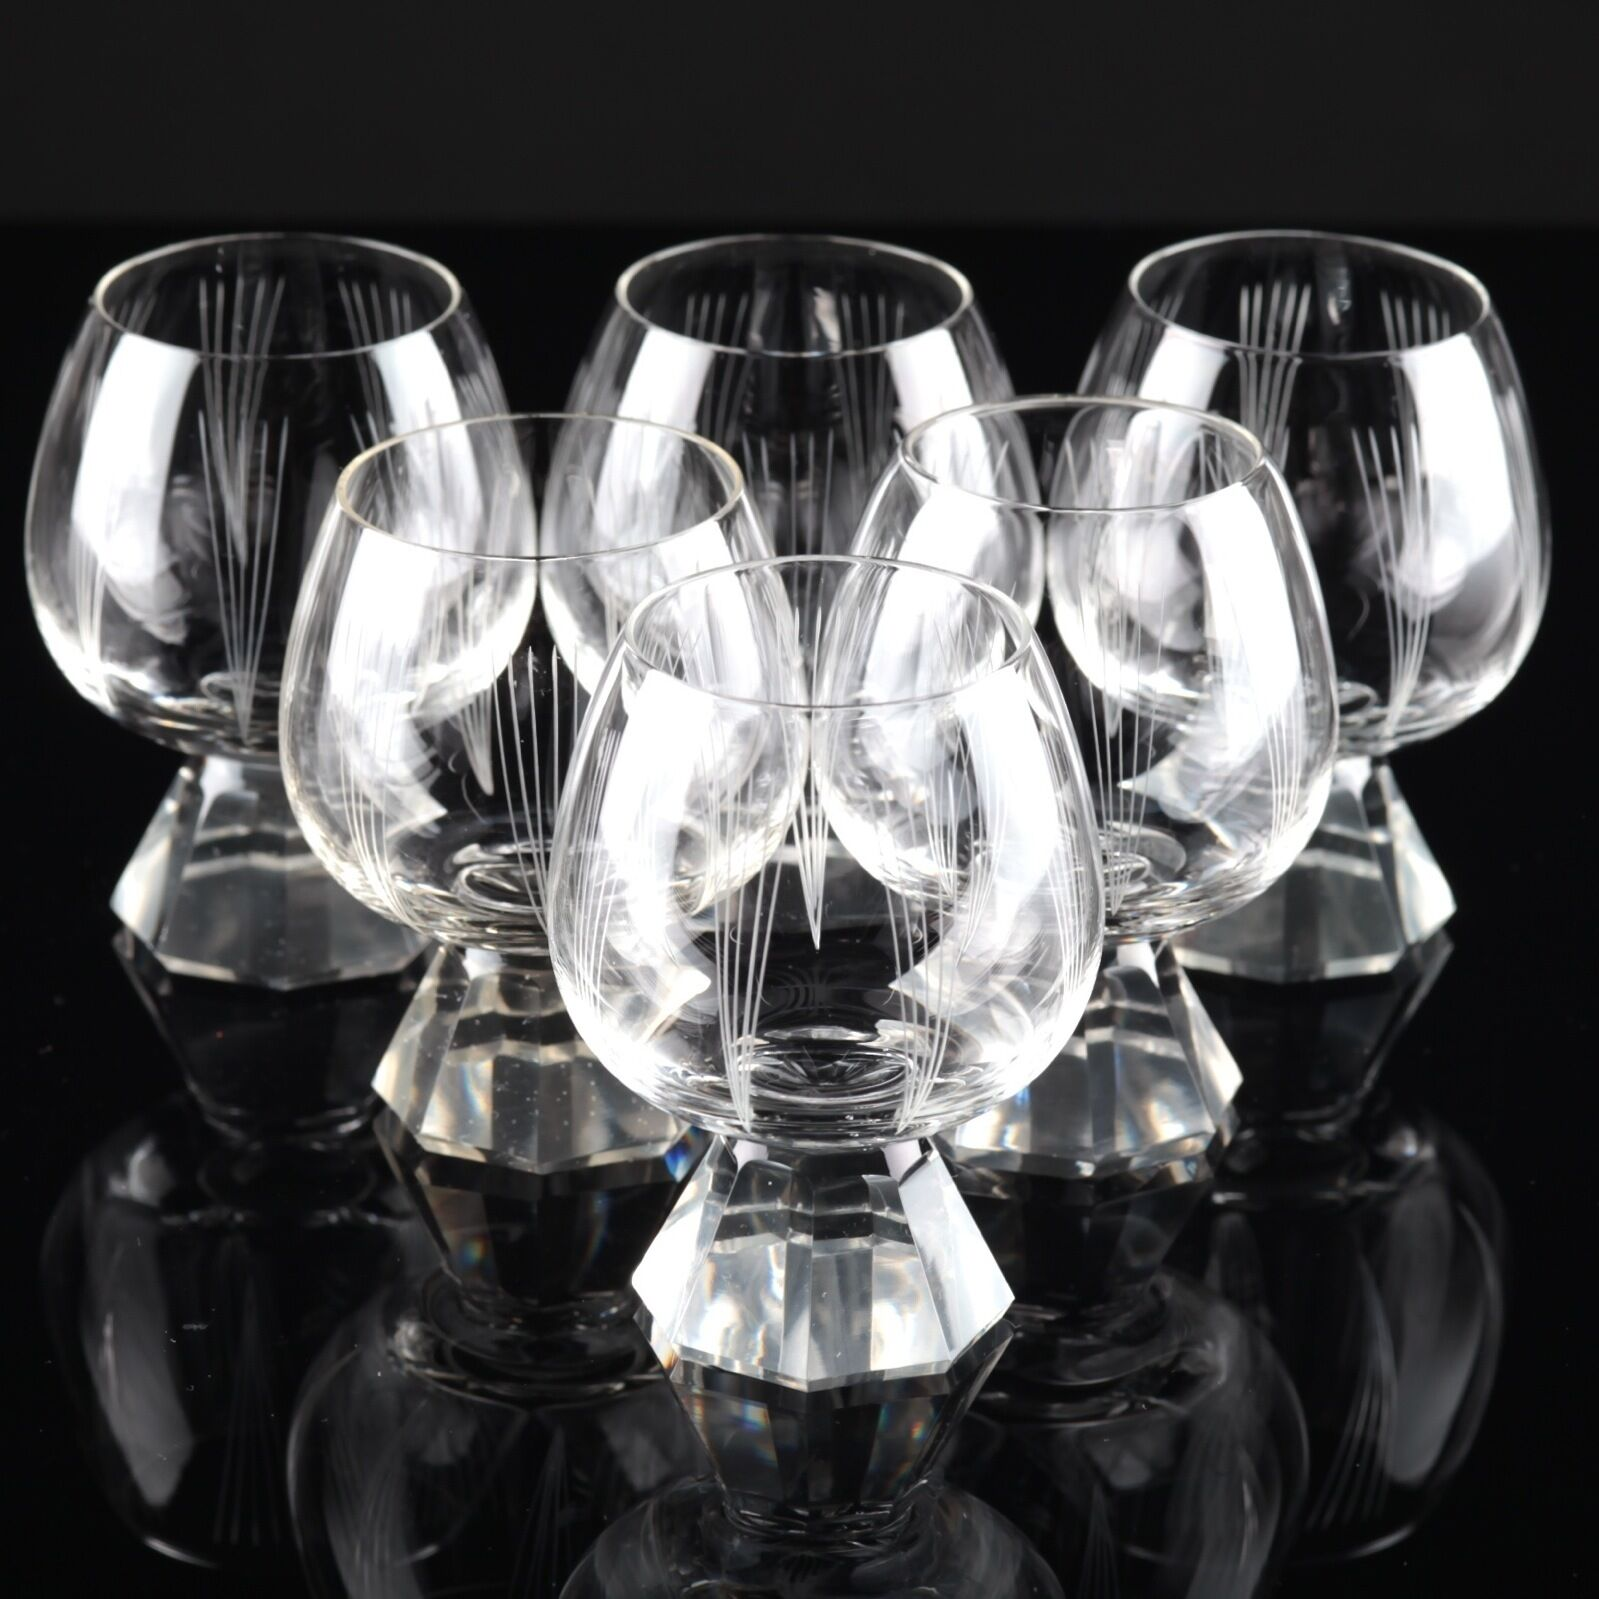 6 Vintage Cognacgläser Friedrich Kristall Glas Linien Gravur Strahlen Gläser F | Billig